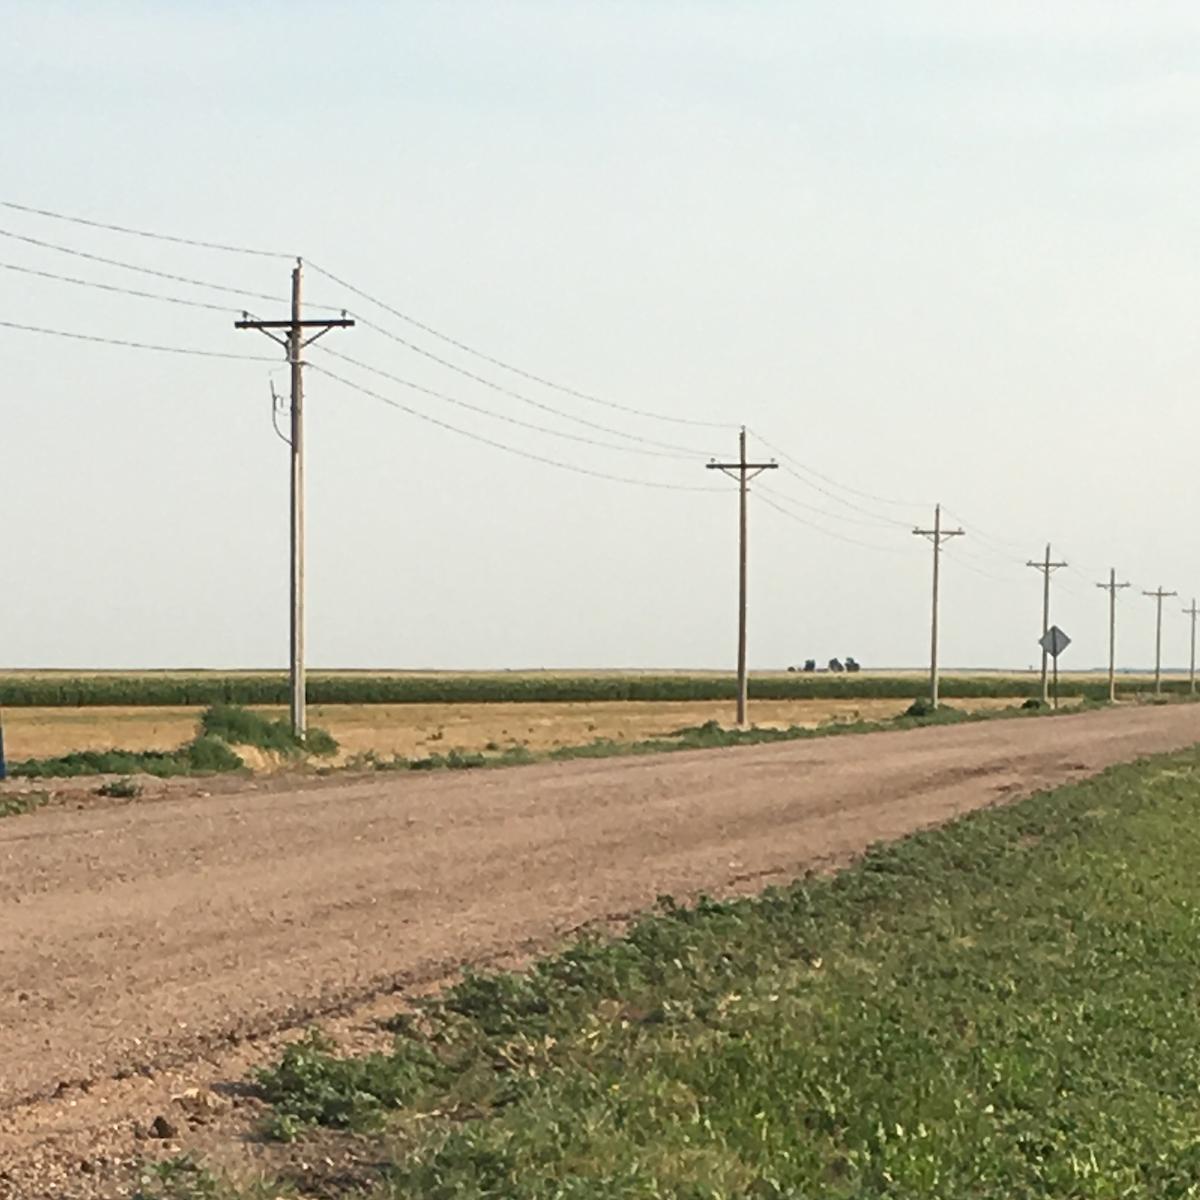 Reaching rural America with broadband internet service